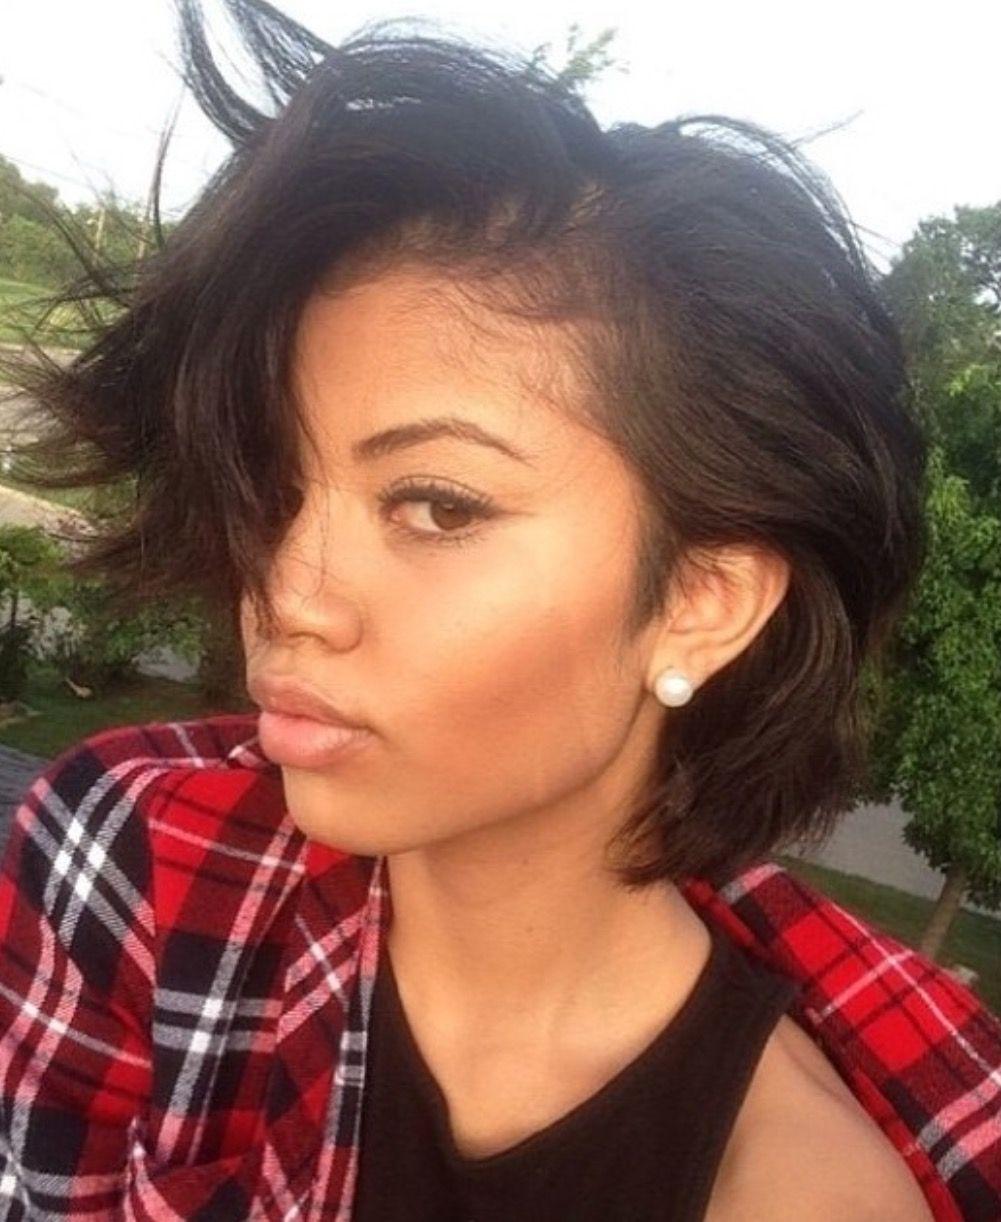 Pin by ebony williams on hair styles pinterest short hair styles